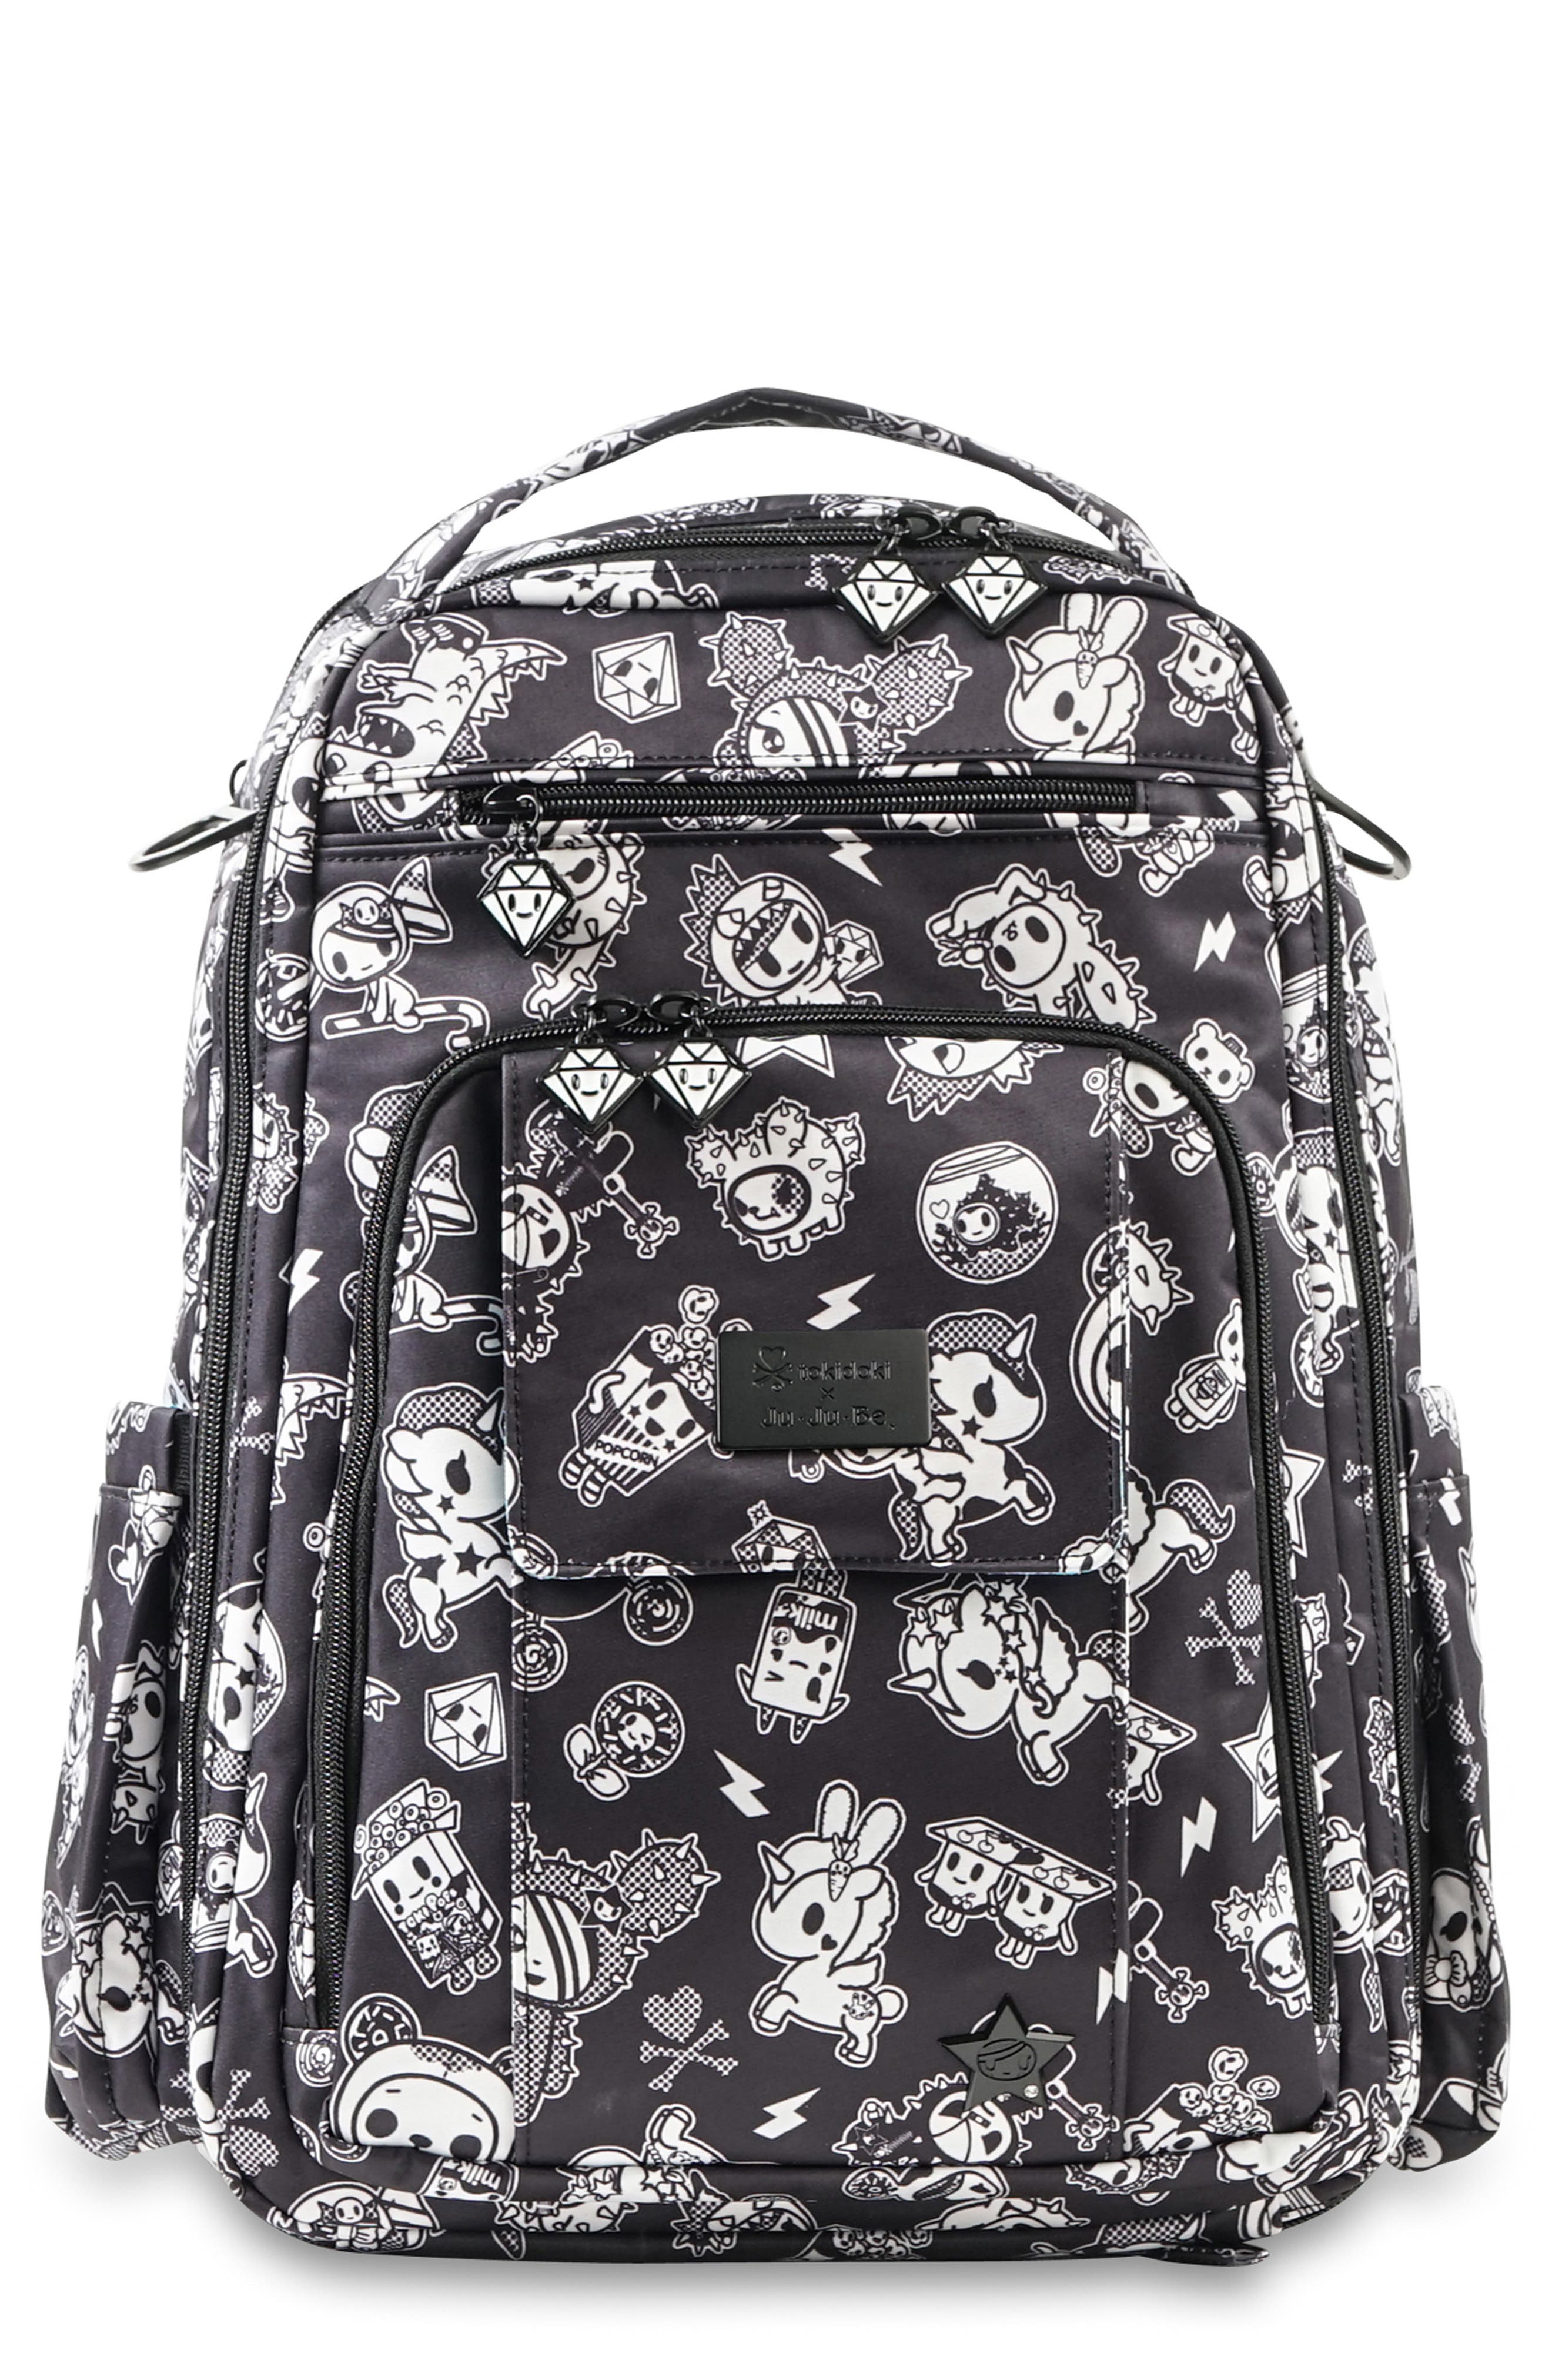 tokidoki x Ju-Ju-Be 'Be Right Back' Diaper Backpack,                         Main,                         color, 009